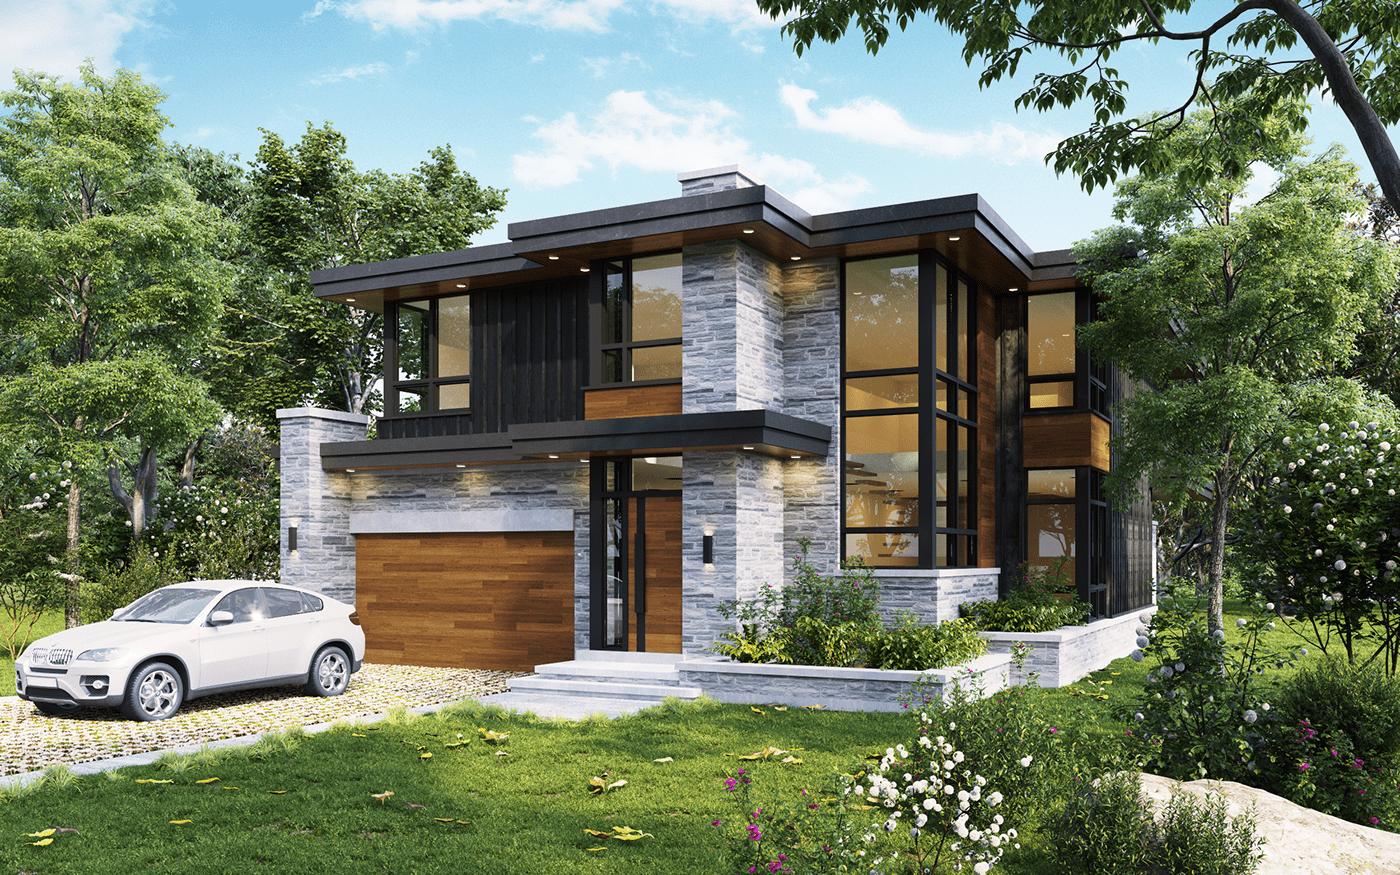 Modern Cozy Home in Canada   DEER Design on Behance